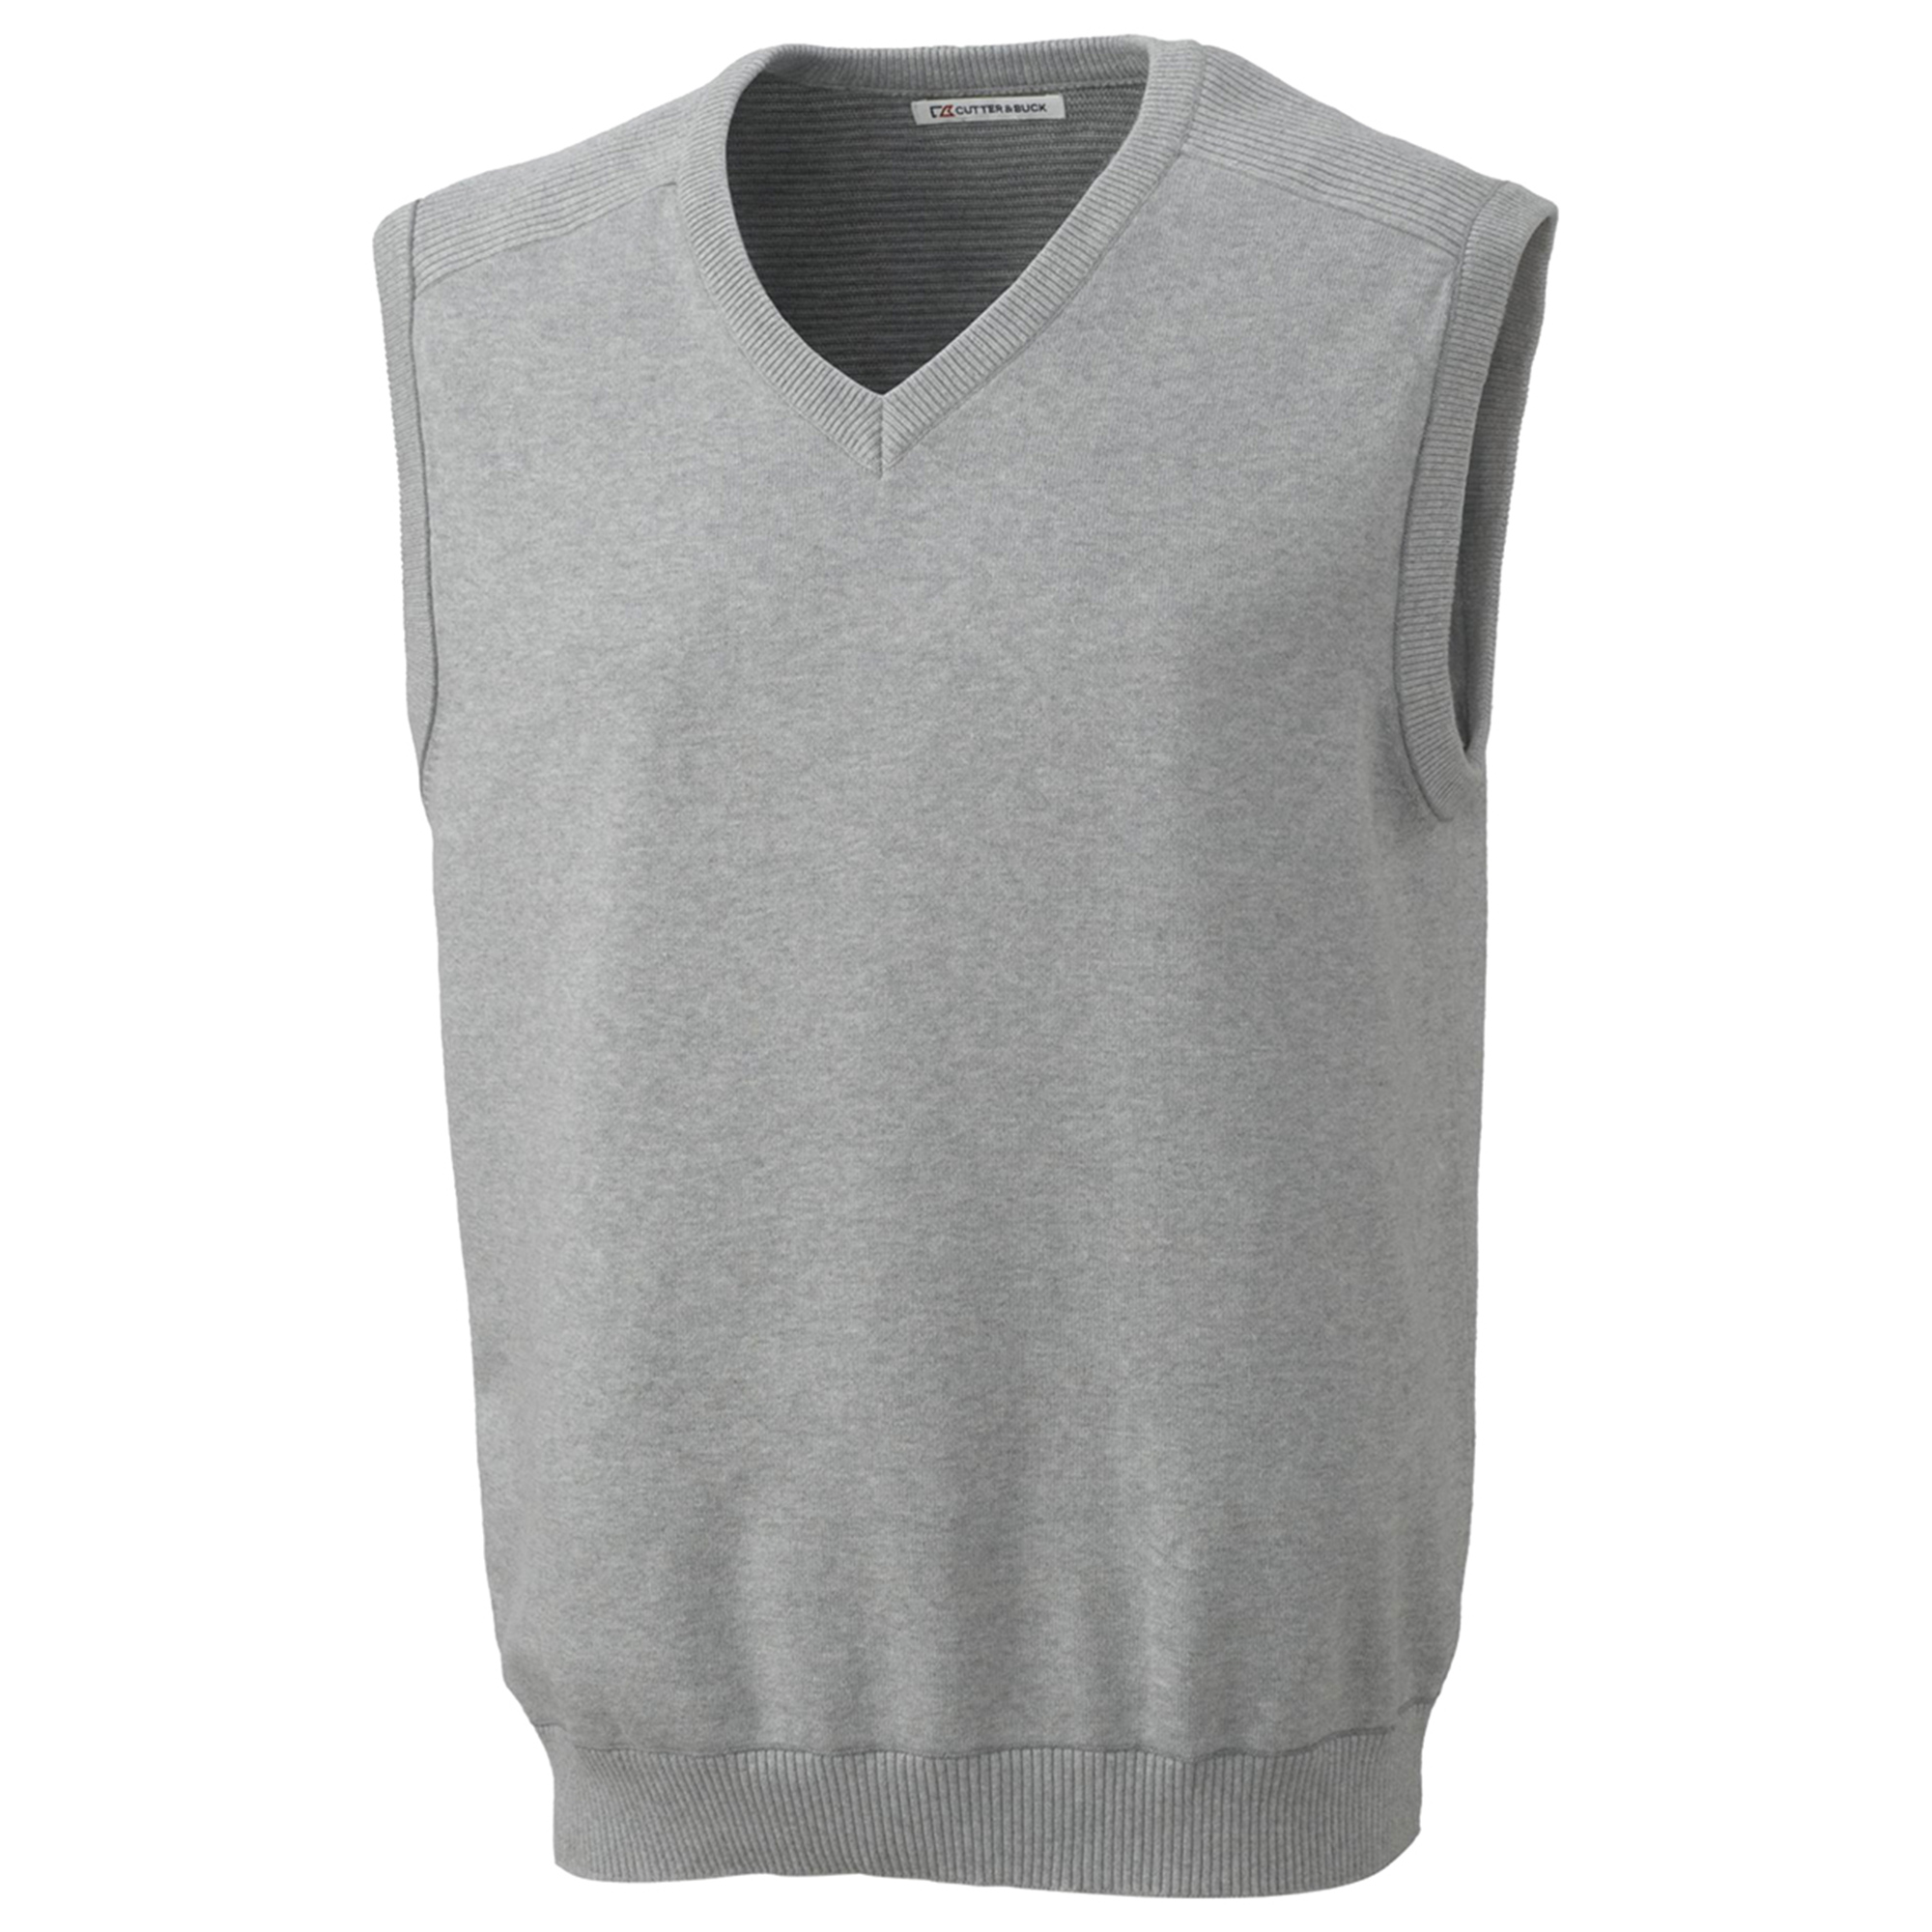 Cutter and Buck BCS01422 Men's Comfort V-Neck Sweater Vest